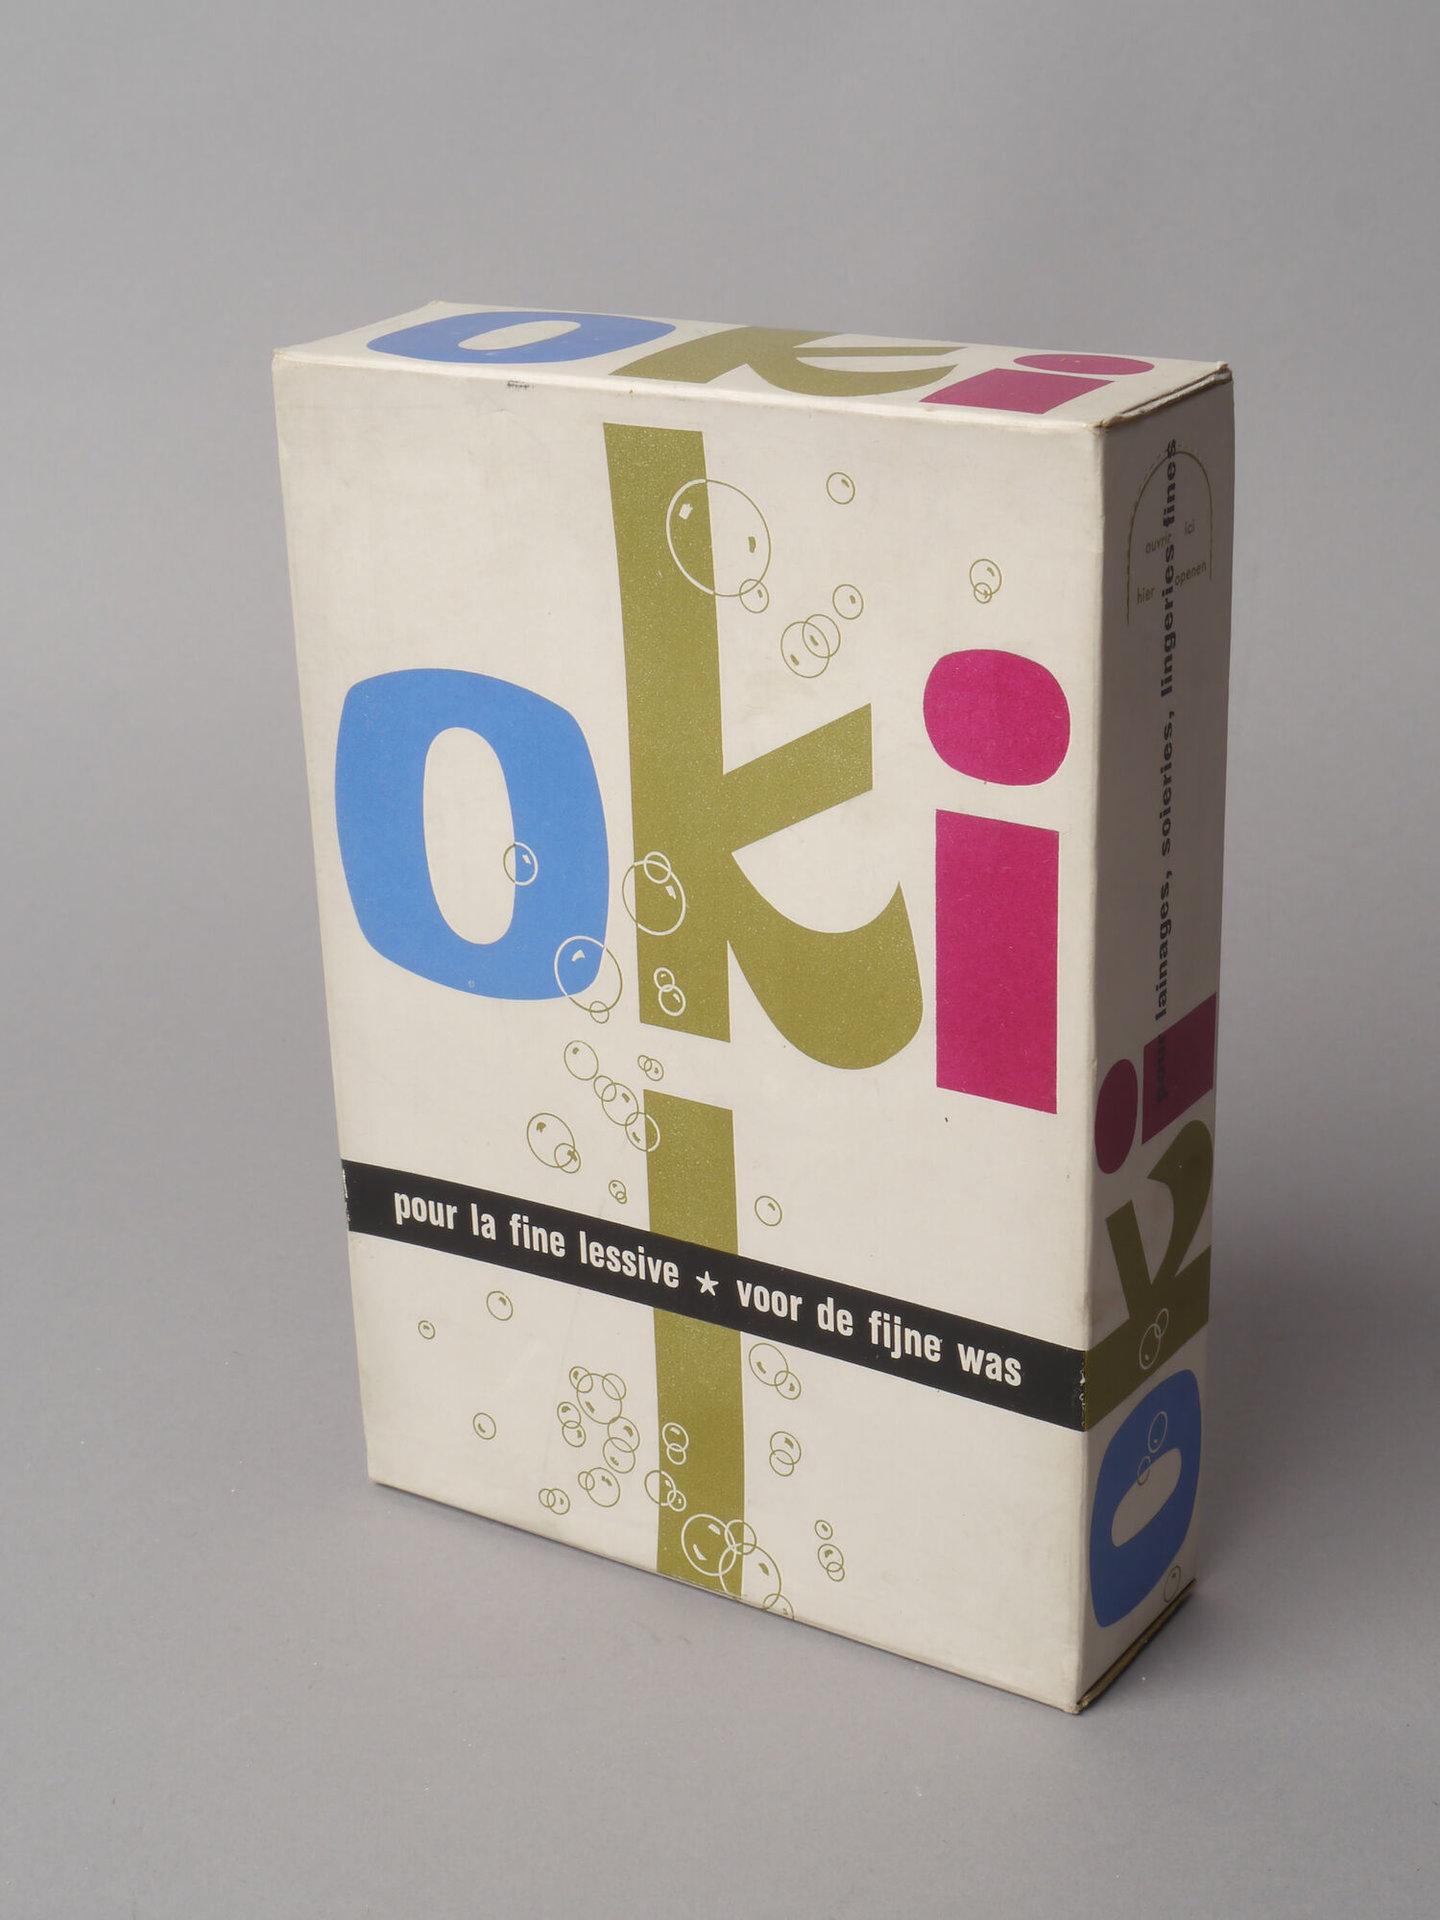 Doos waspoeder van het merk Oki